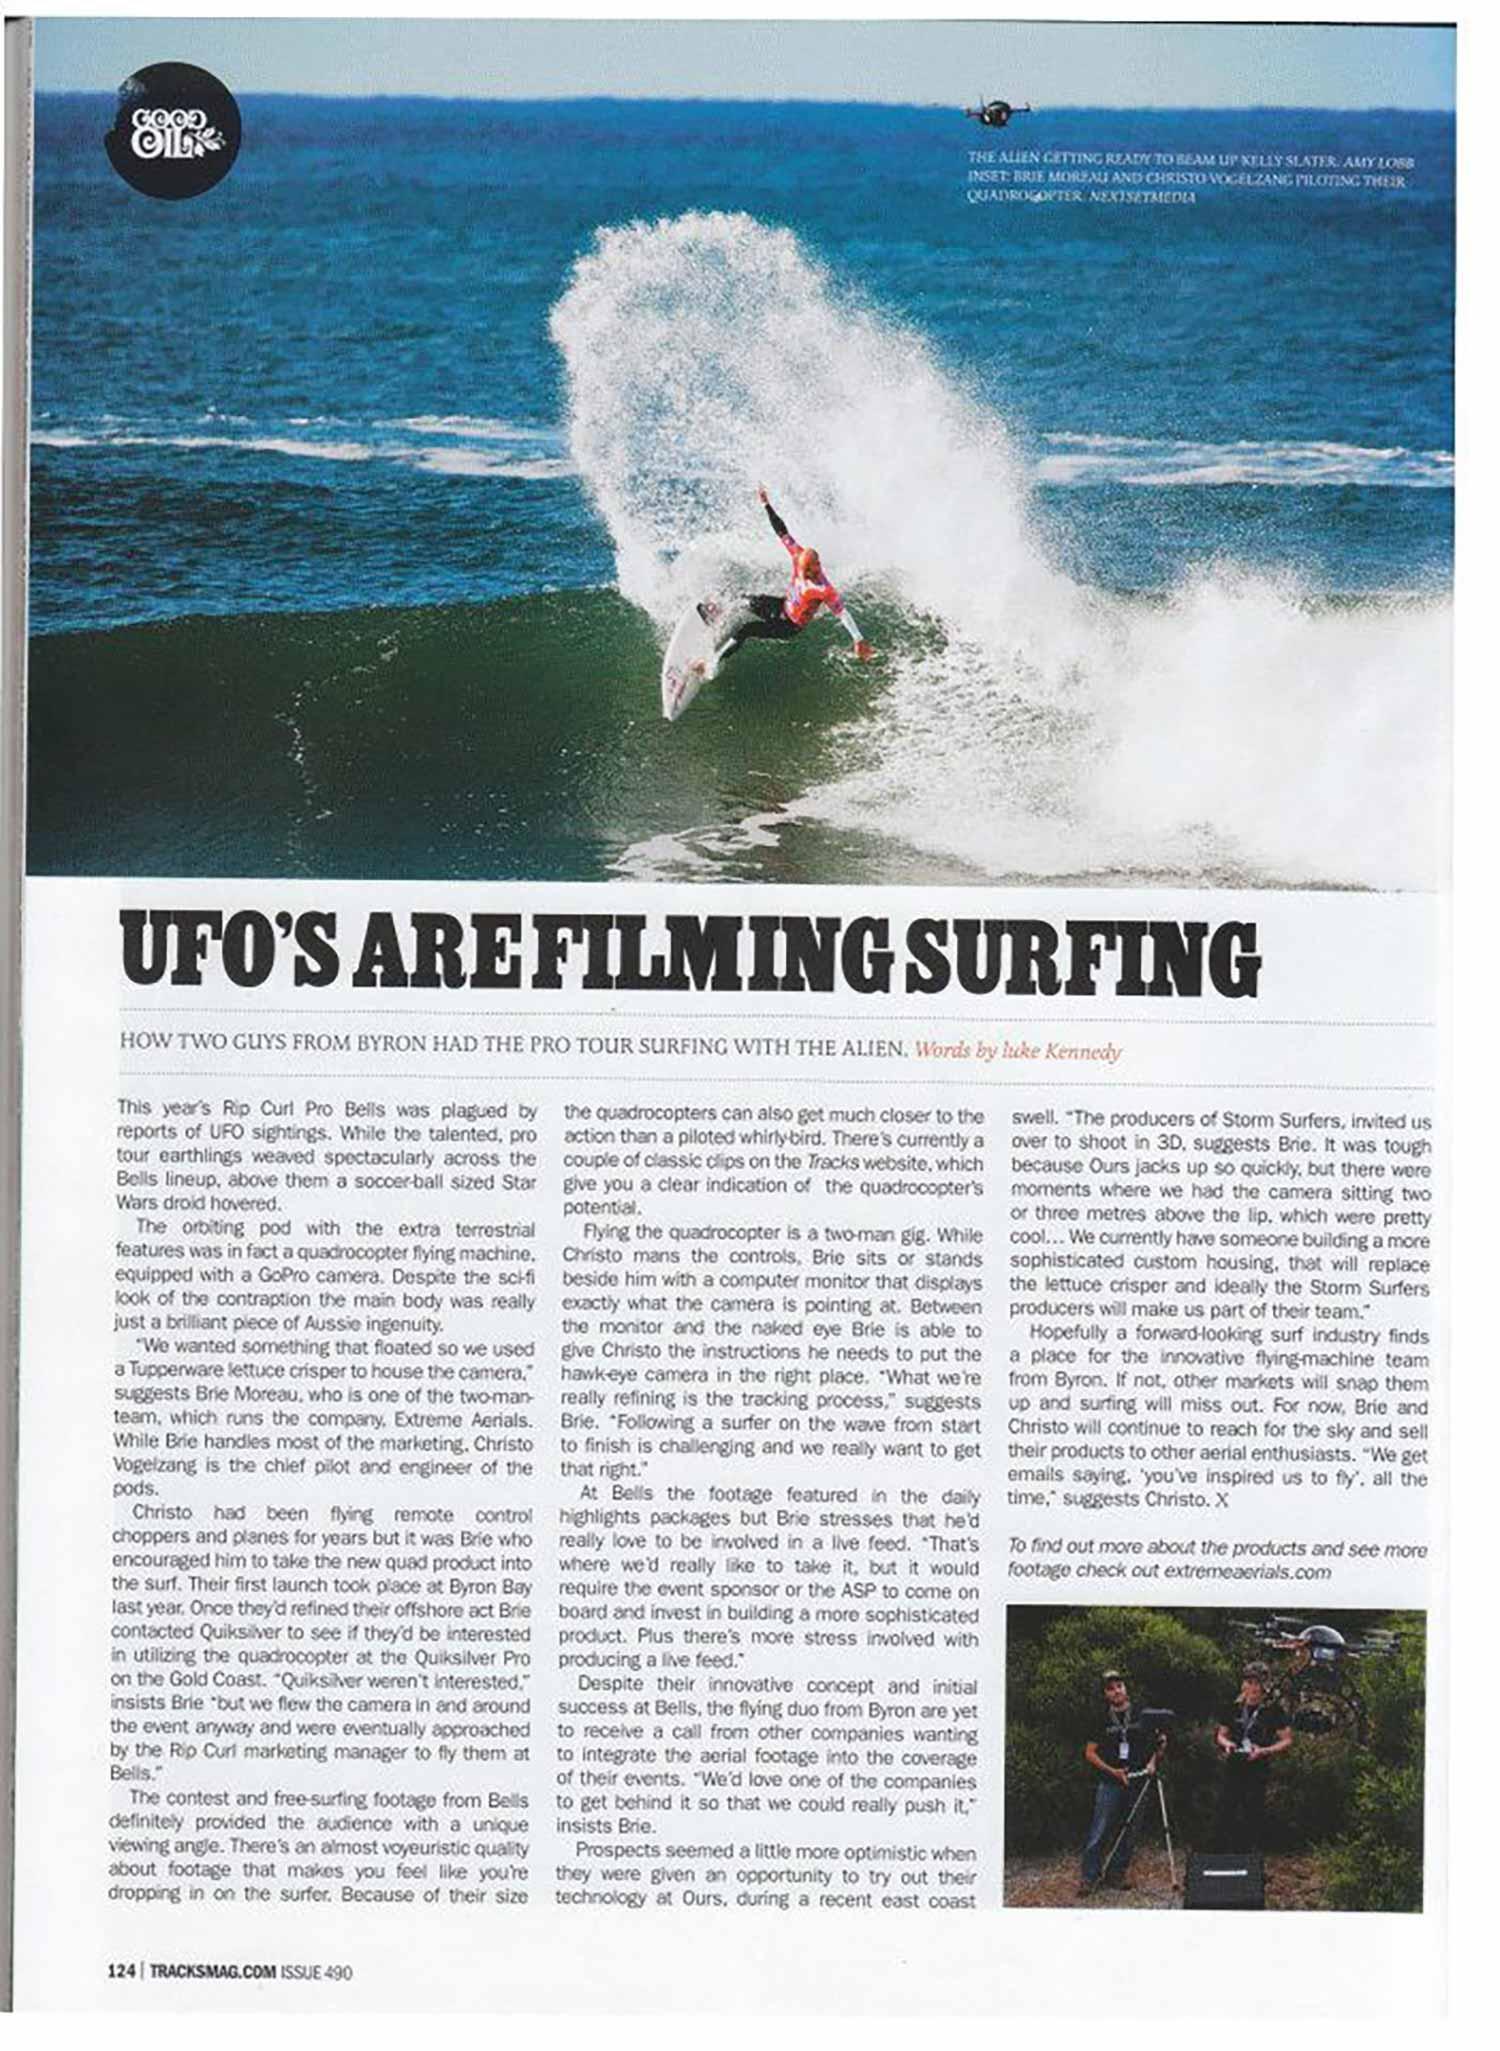 Tracks Magazine, Issue 490, July 2011